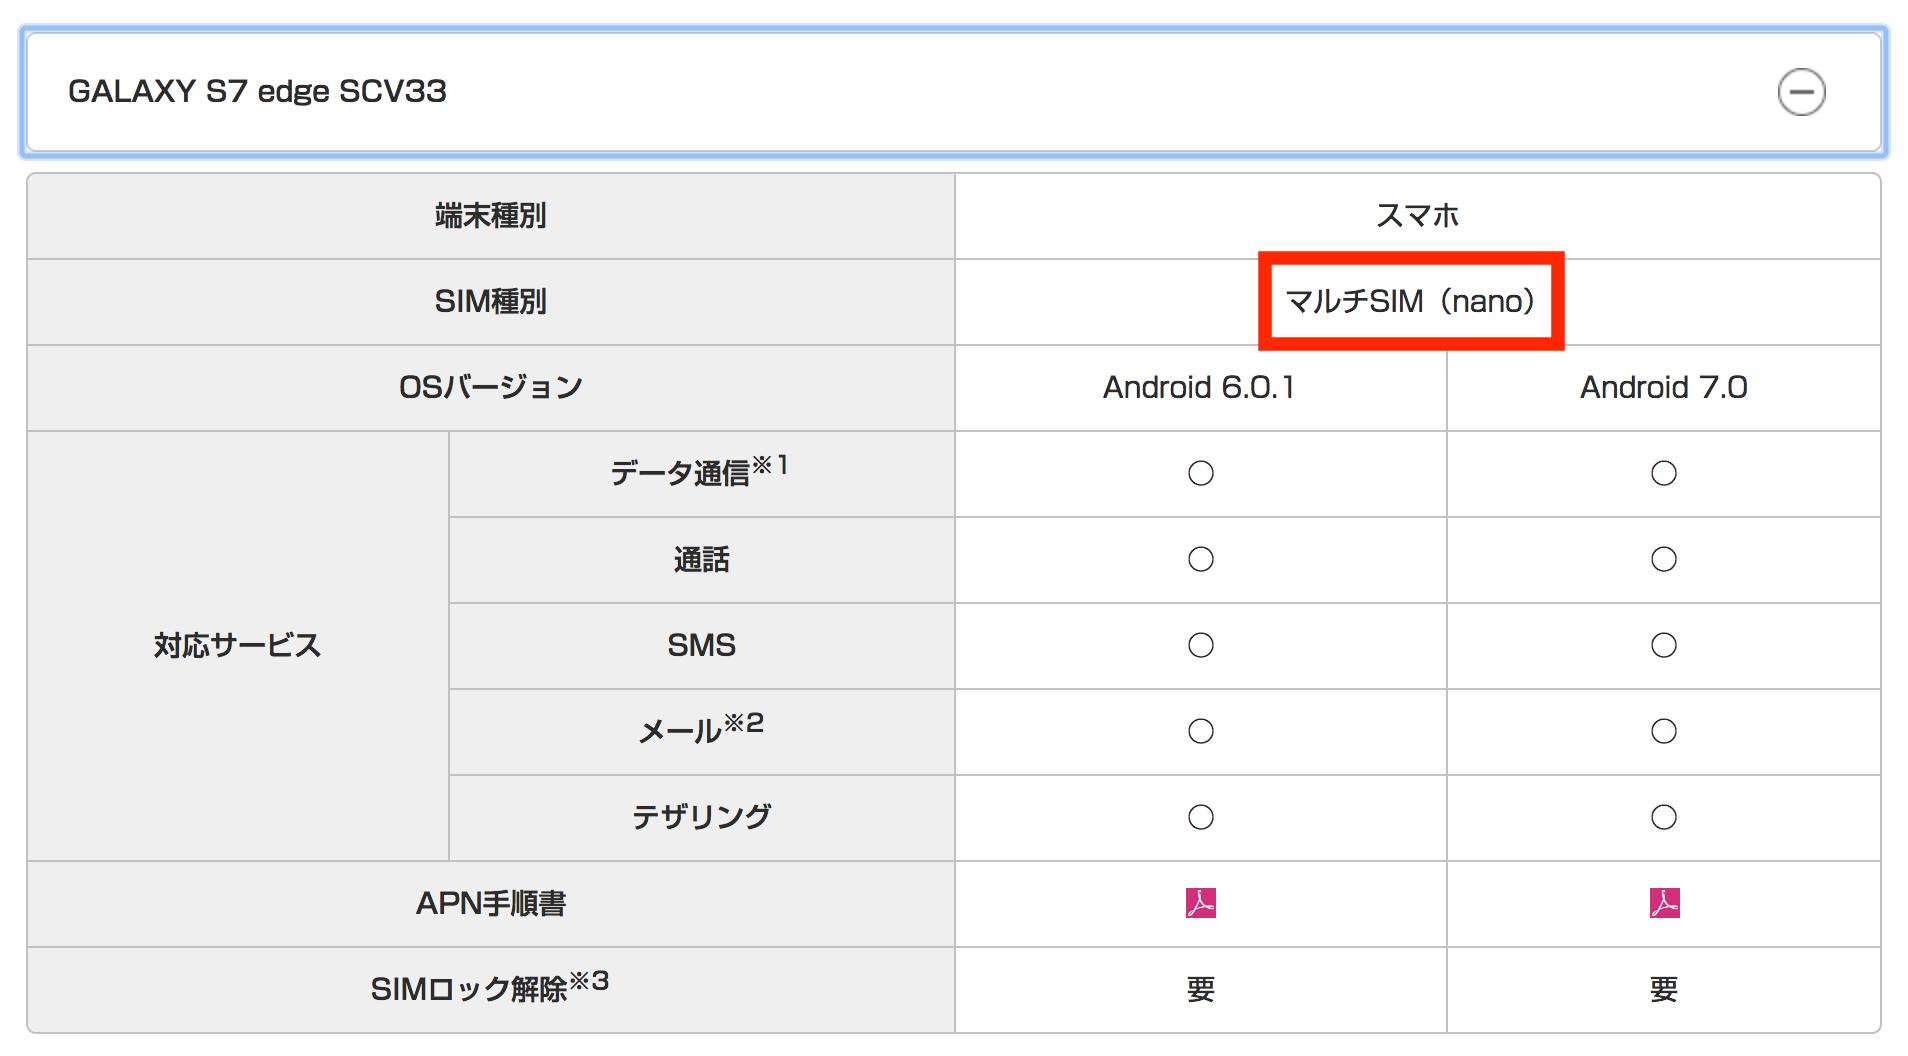 UQモバイル口座振替ではGALAXYはマルチSIM